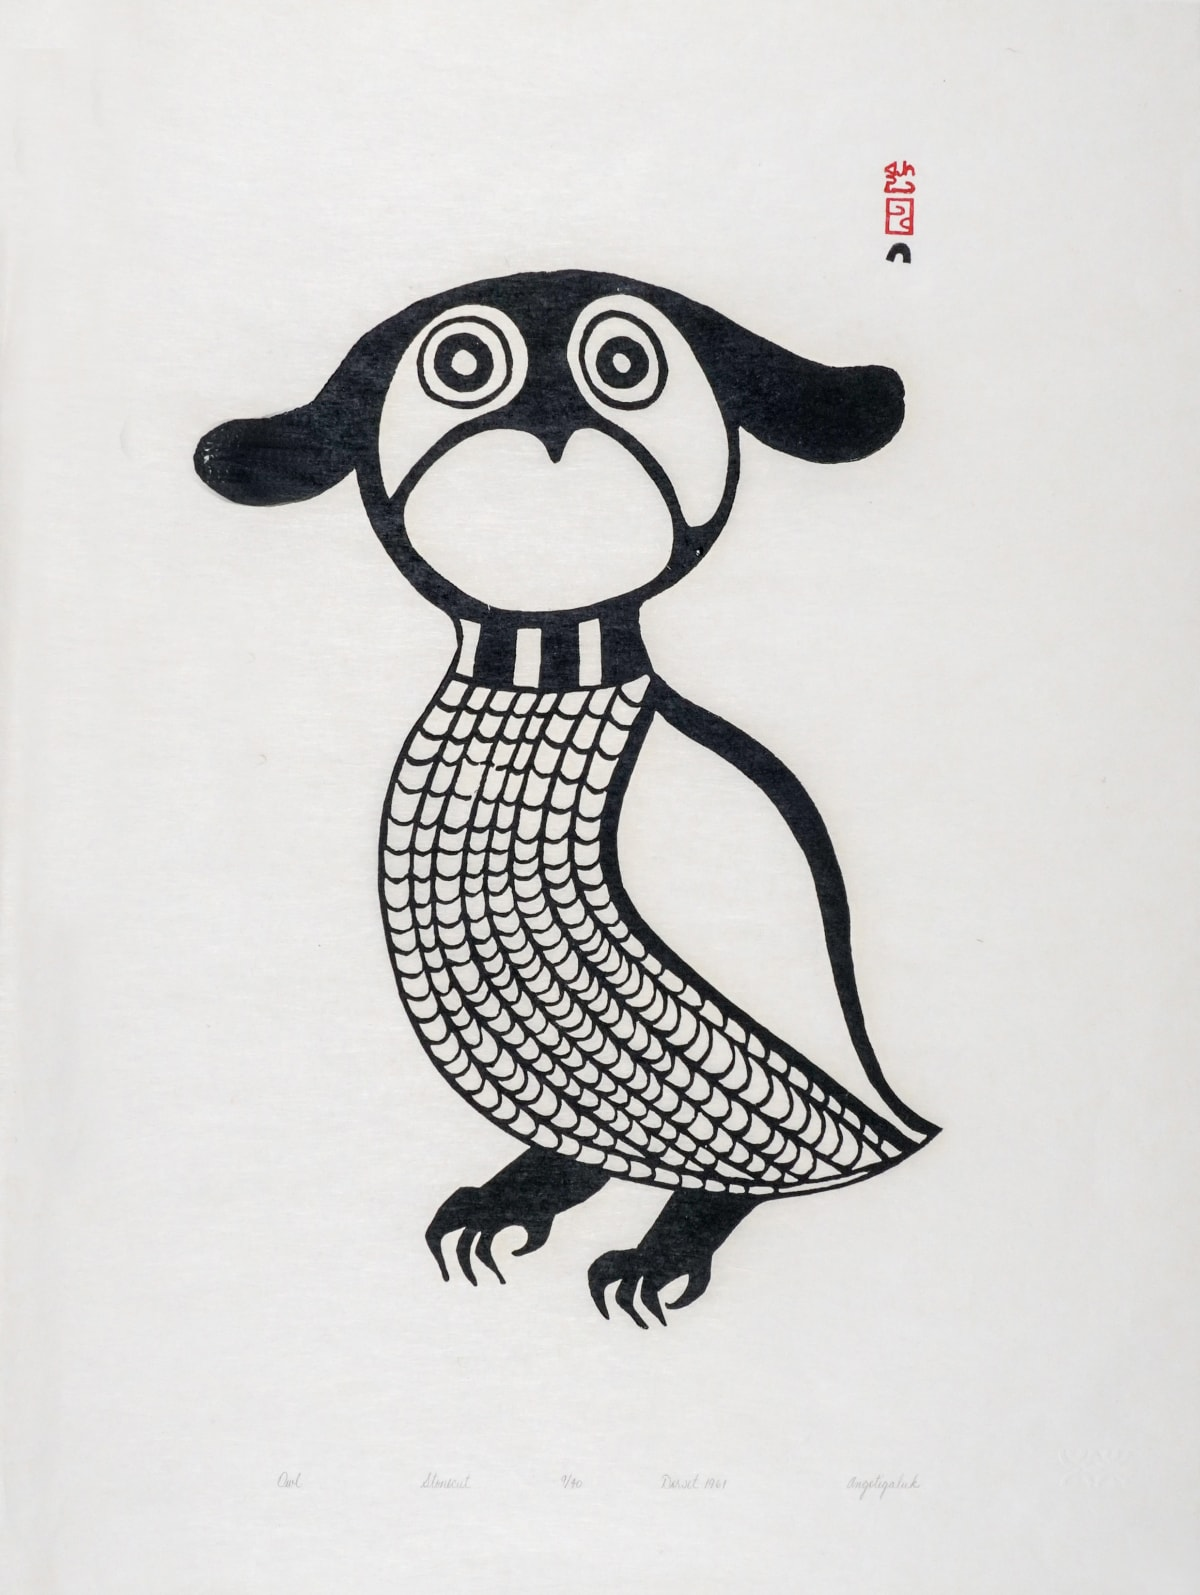 LOT 38 ANGOTIGALUK TEEVEE (1910-1967) KINNGAIT (CAPE DORSET) Owl, 1961 (1994) stonecut, 22 x 17 in (55.9 x 43.2 cm) ESTIMATE: $1,500 — $2,500